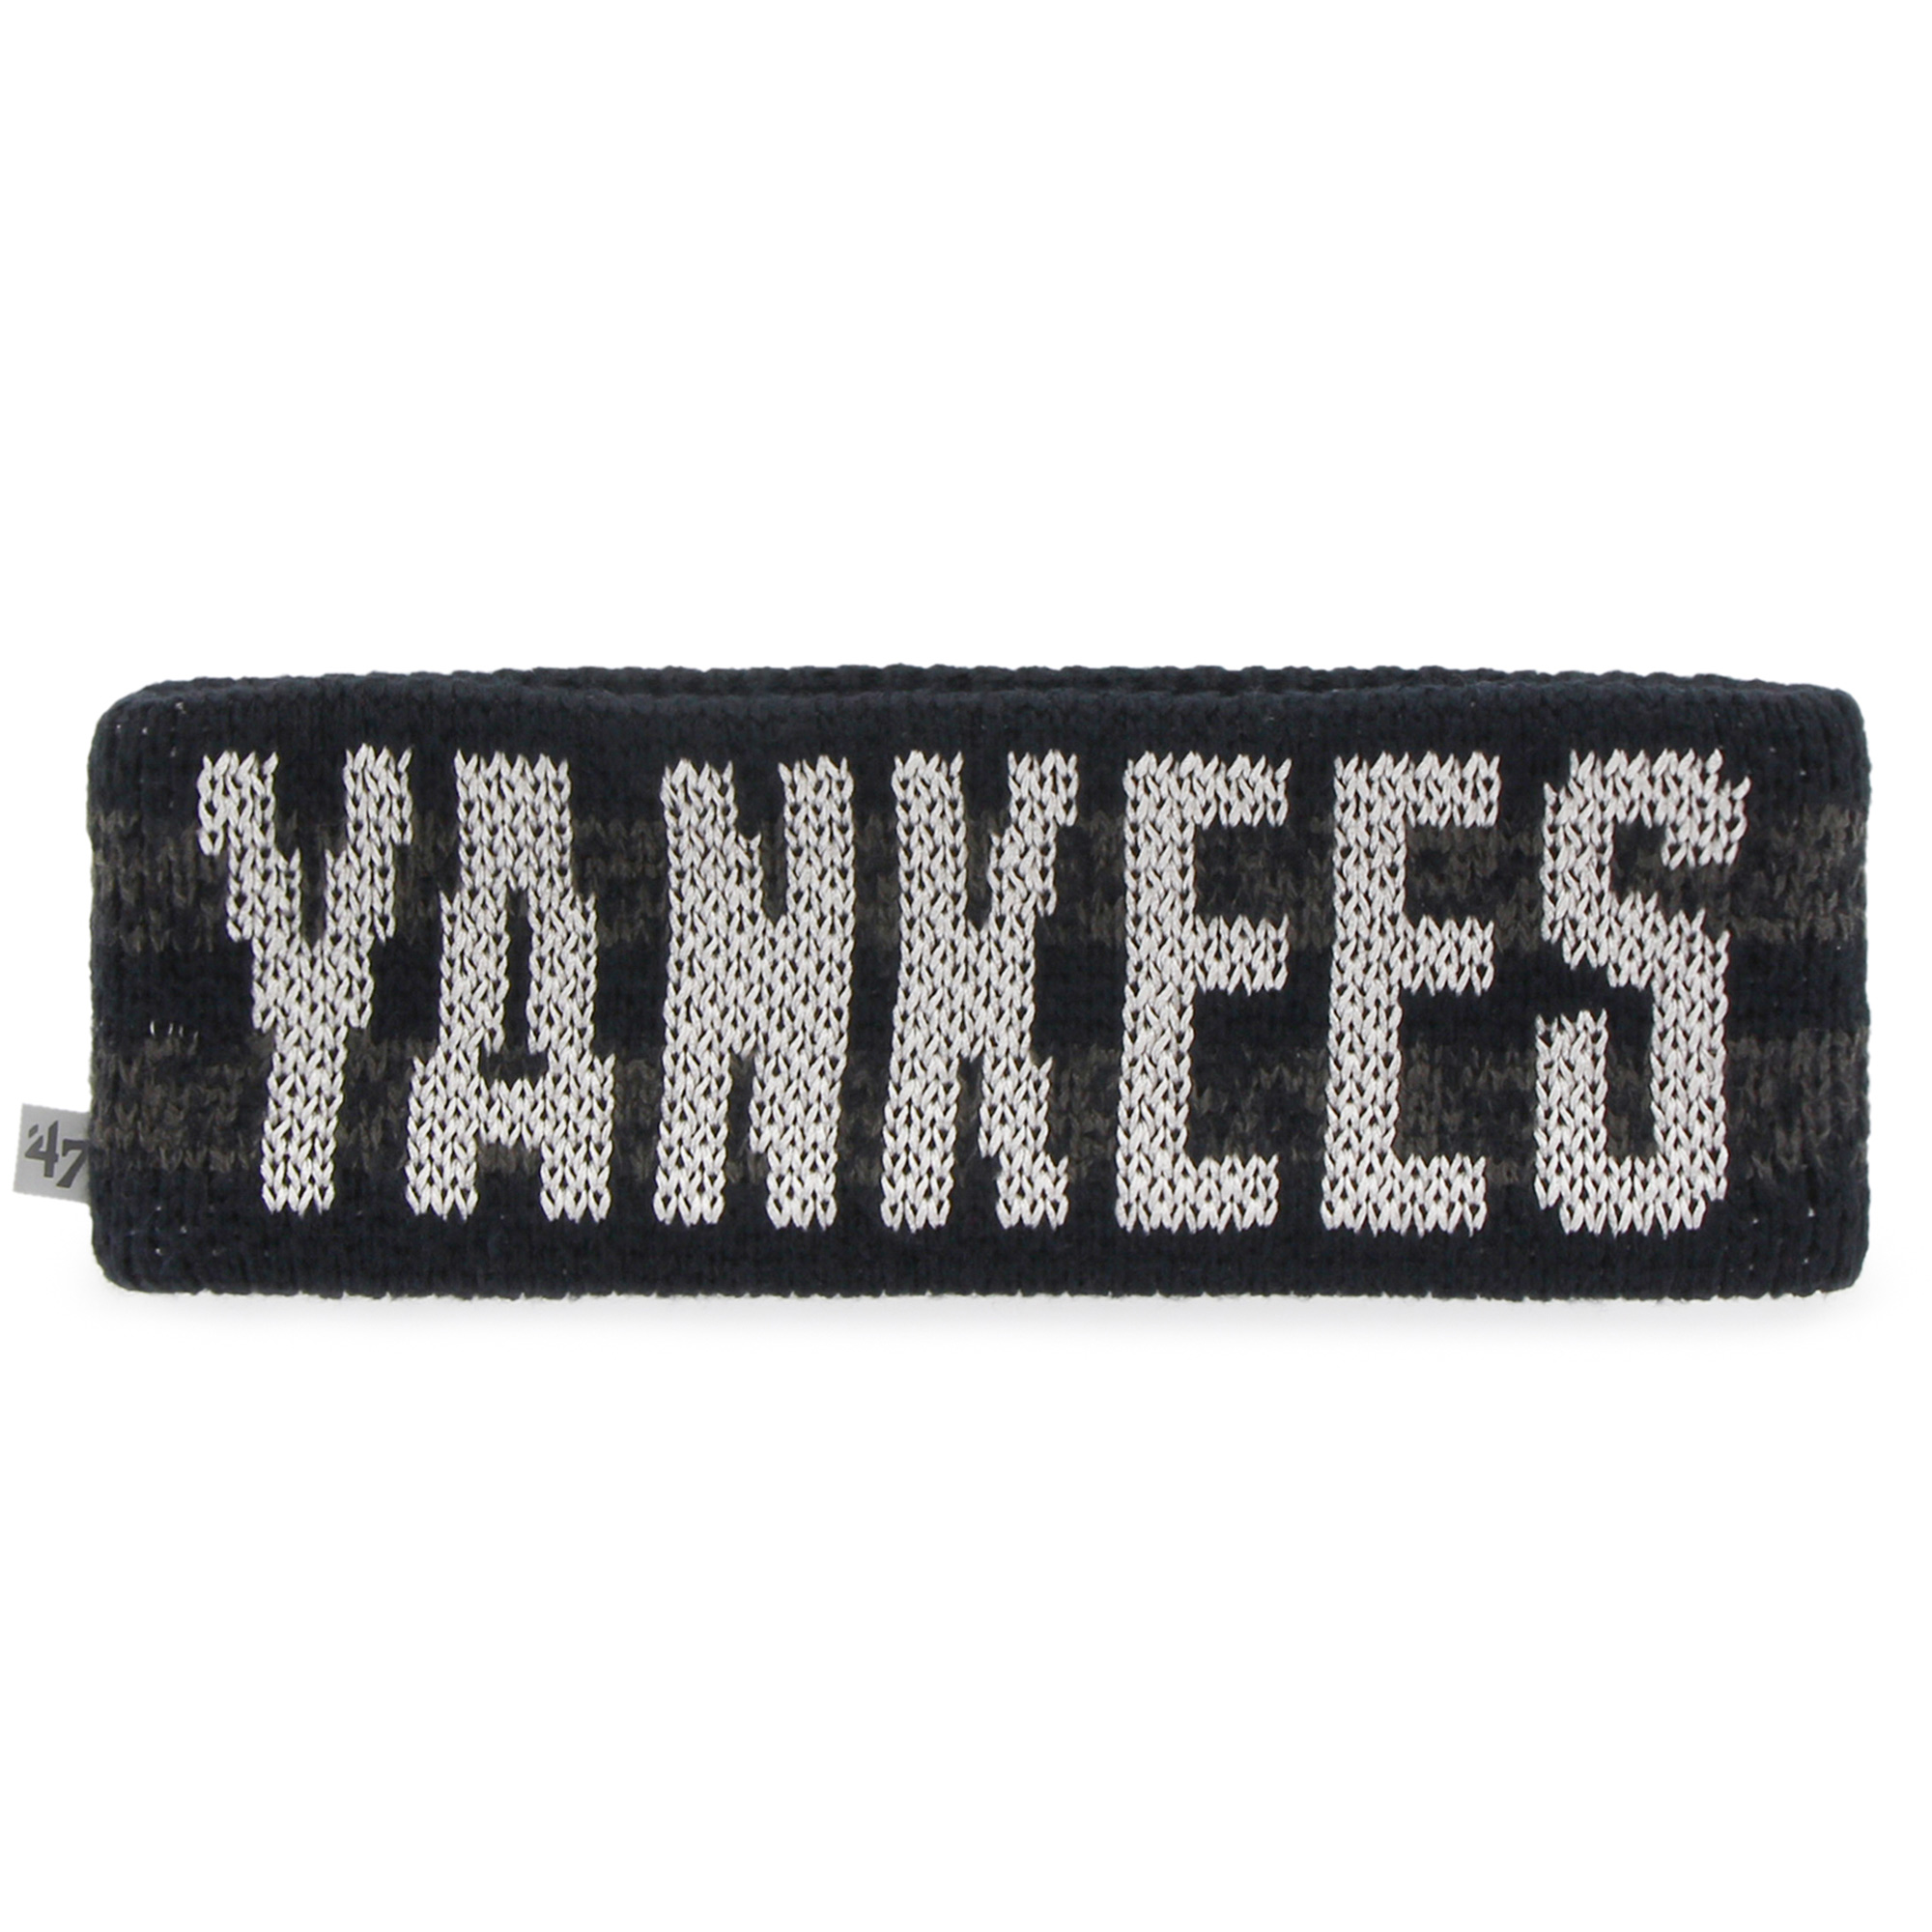 New York Yankees '47 Women's React Headband - No Size